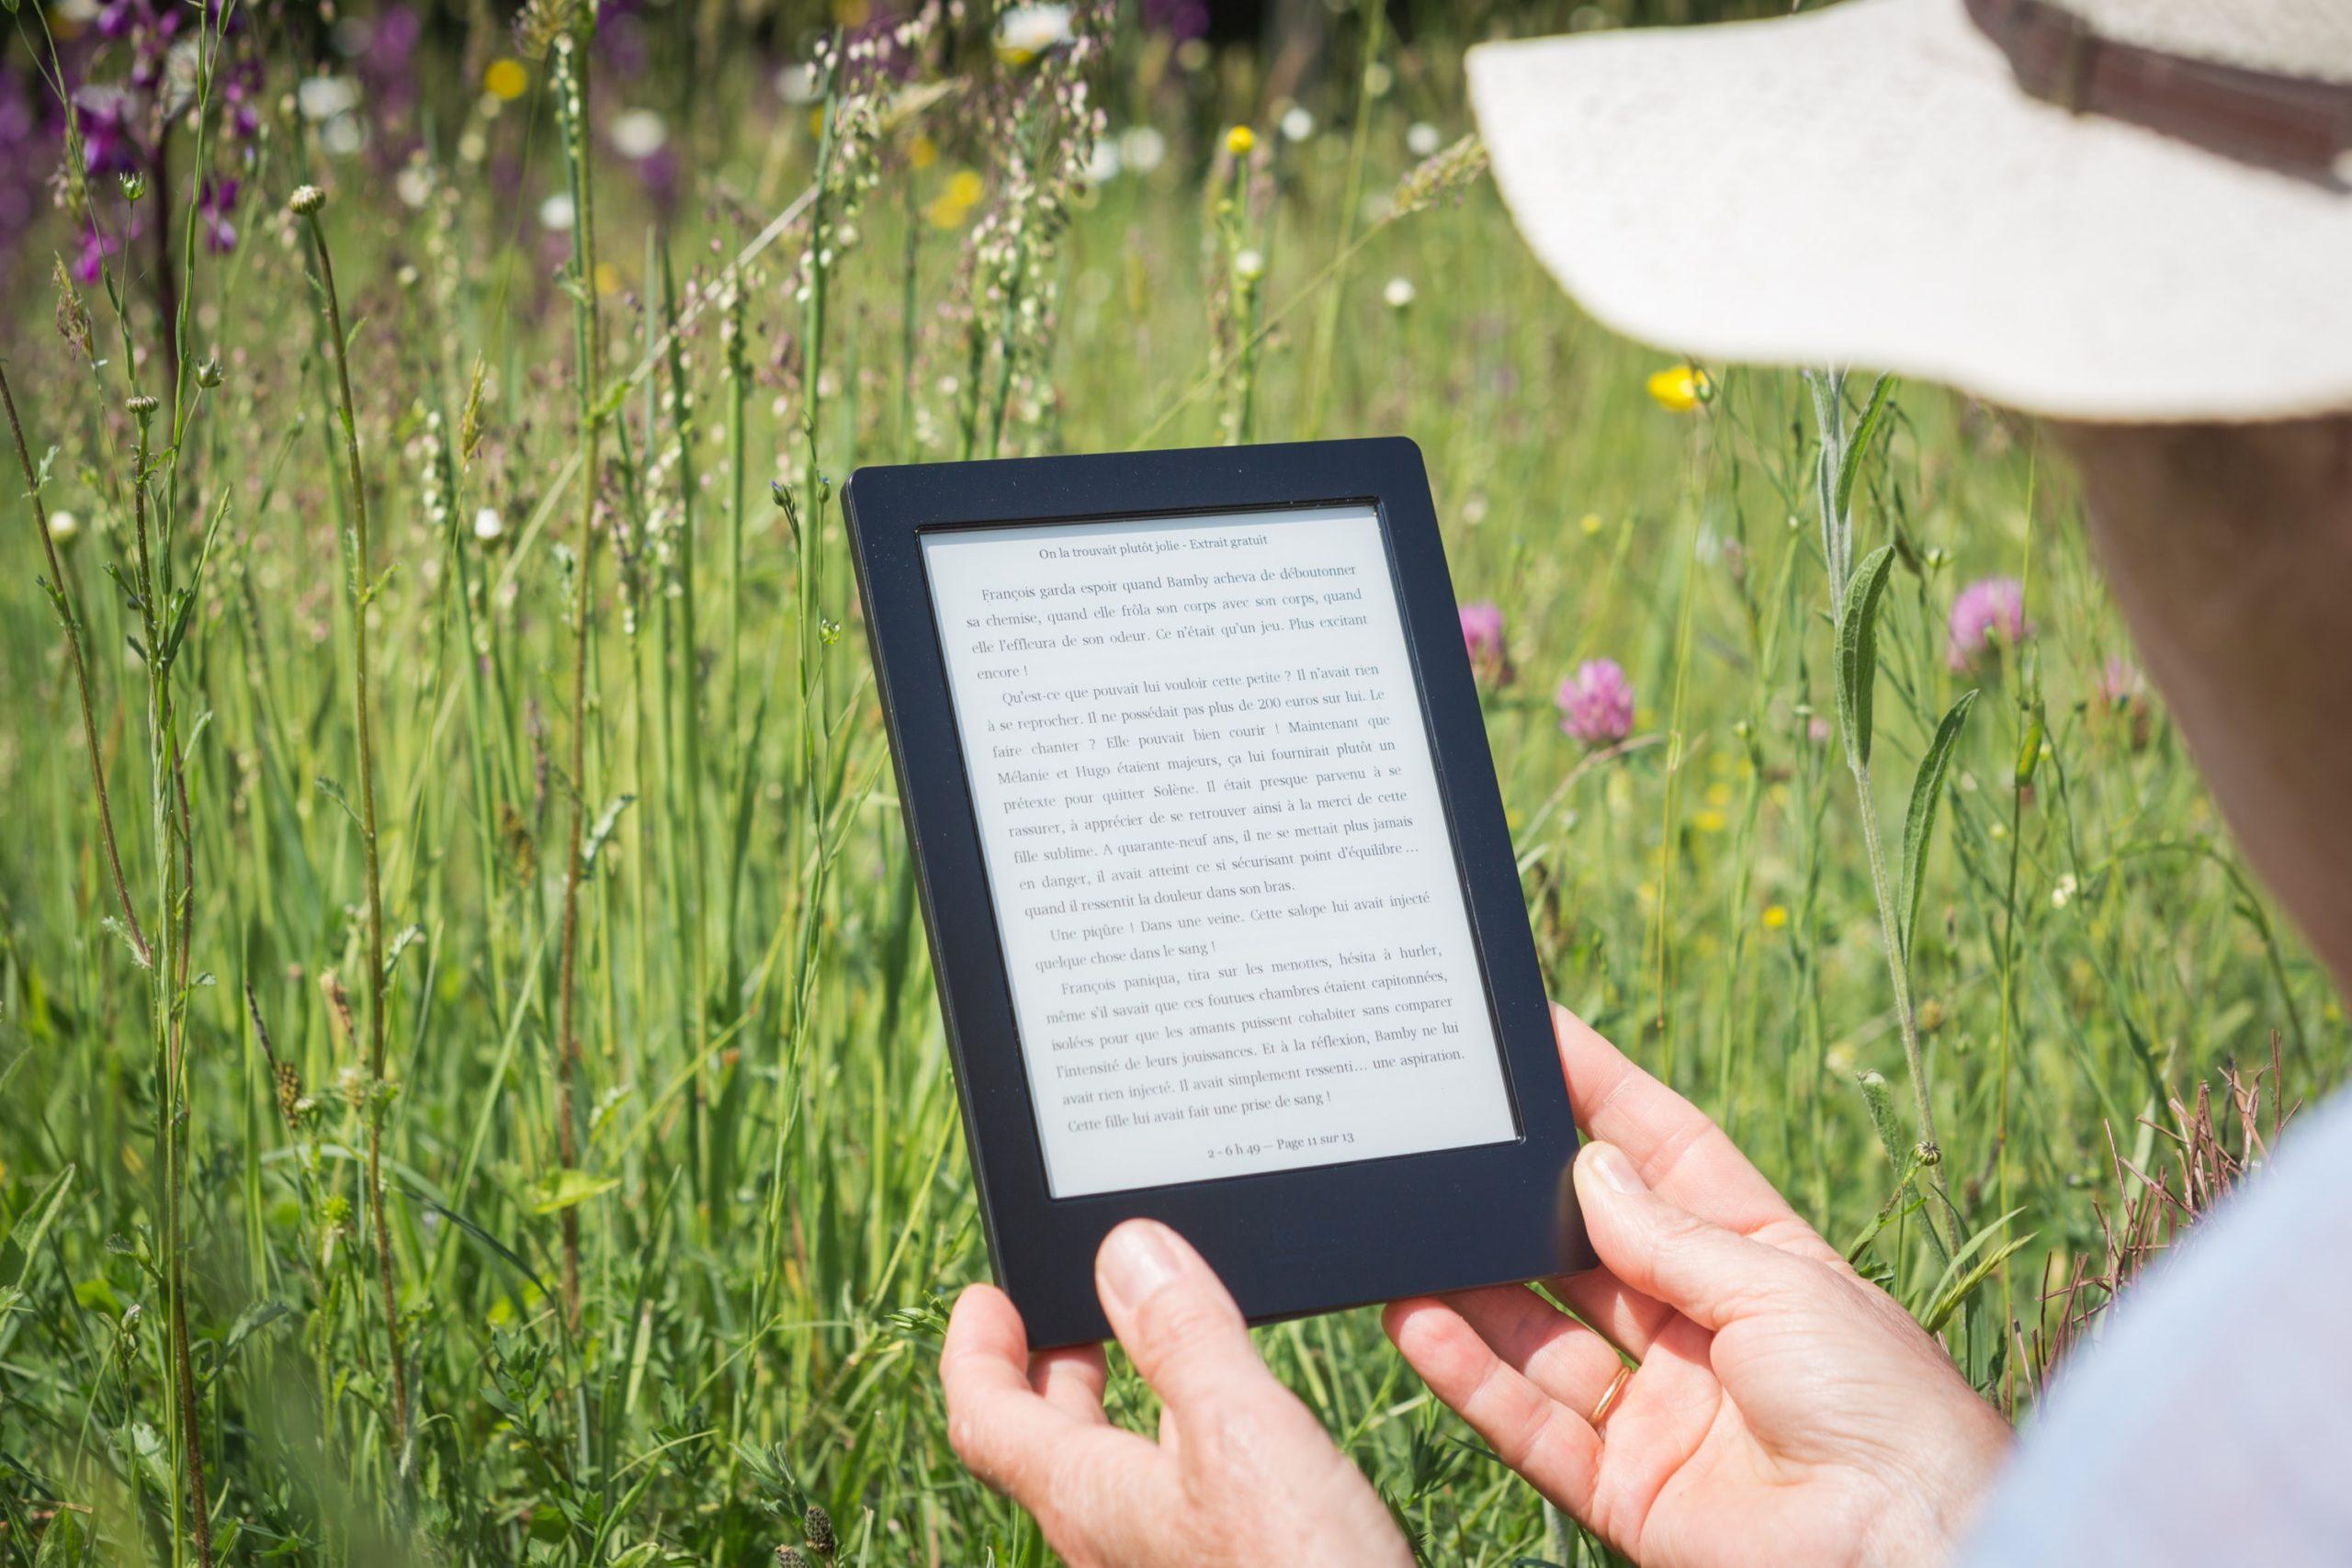 Senior Reading Online Using Kindle